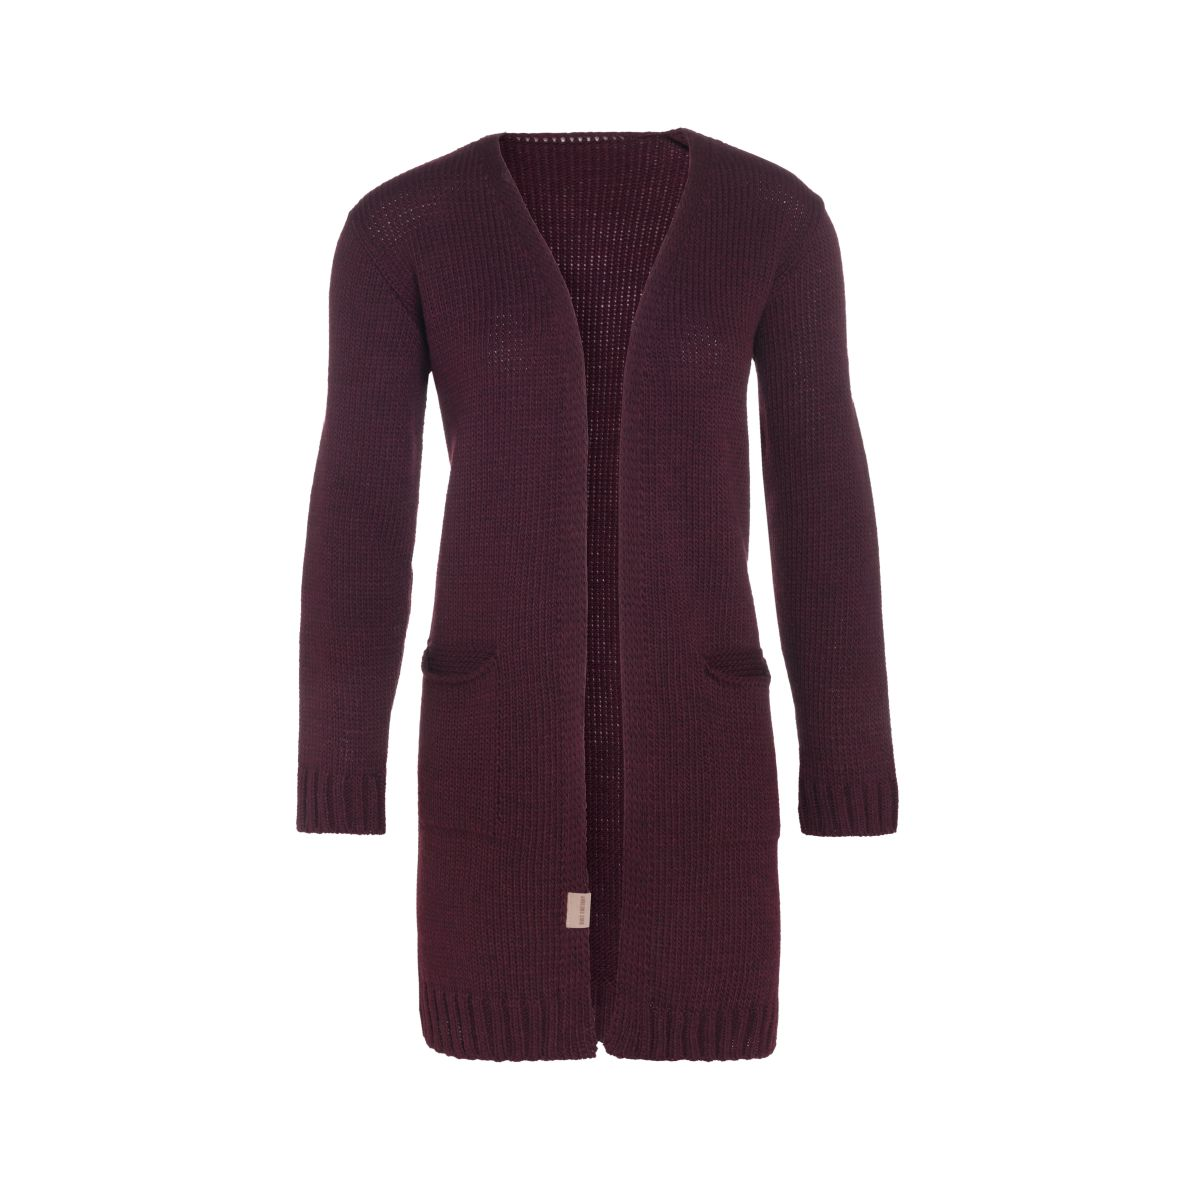 knit factory kf14008102349 ruby vest aubergine 3638 1